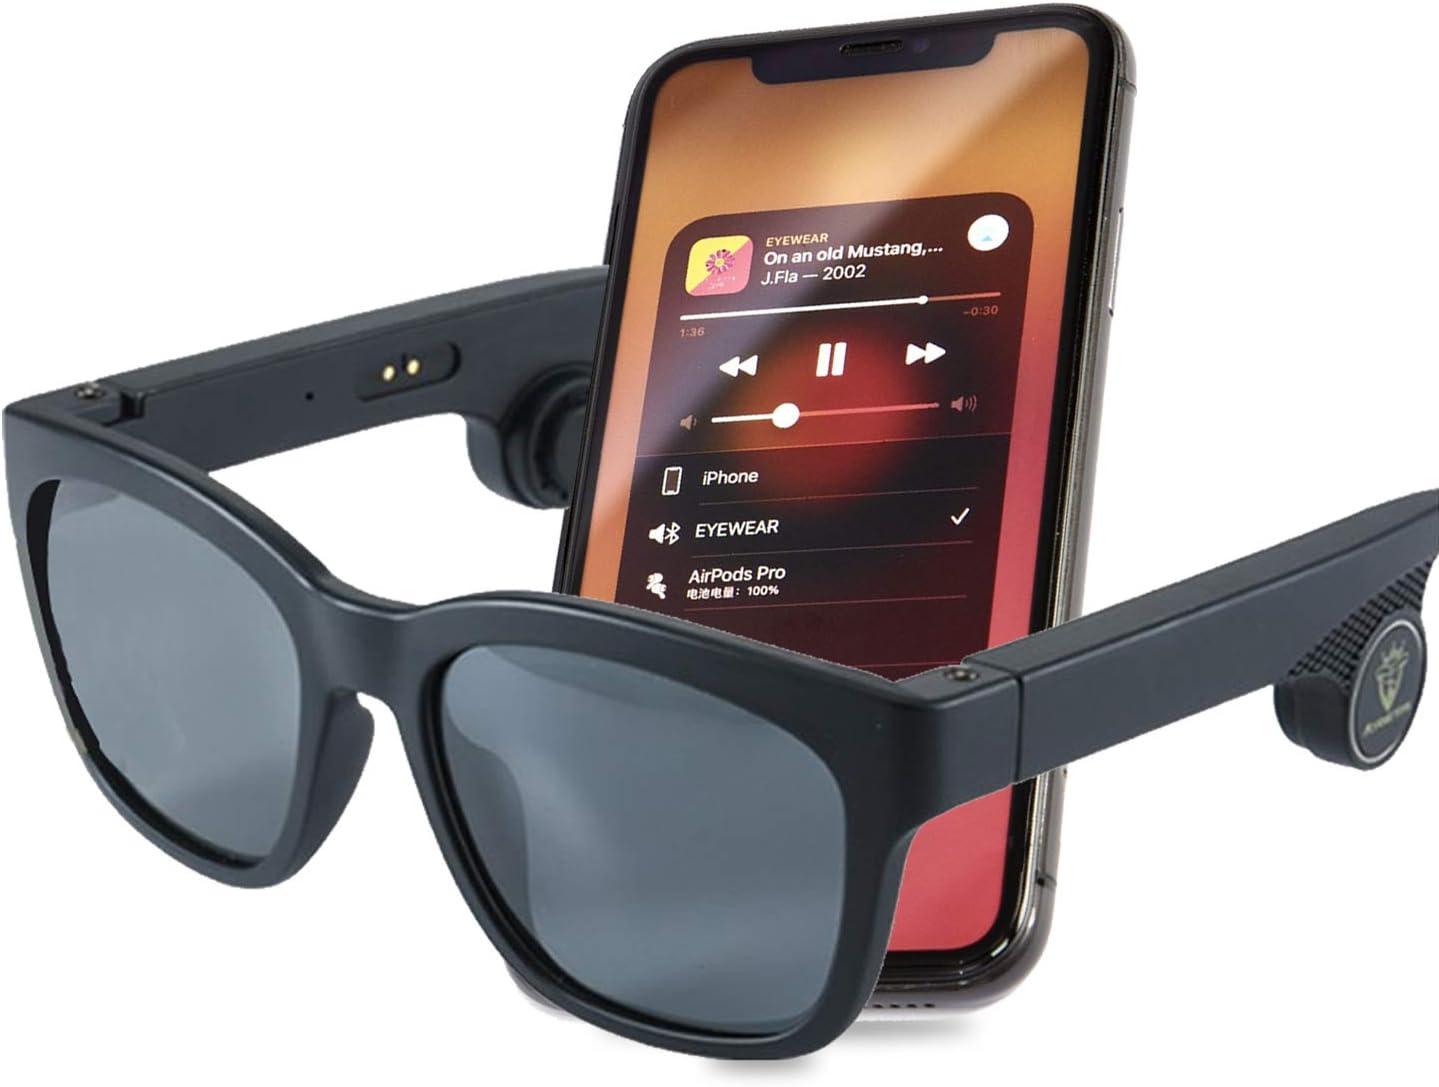 Cacoffay Smart Bluetooth Glasses, Lightweight Anti Eyestrain Blue Light Filter Eye Glasses, Mens Polarised Sunglasses 100% UV Protection Mens Sunglasses for Driving & Fishing & Sports,A